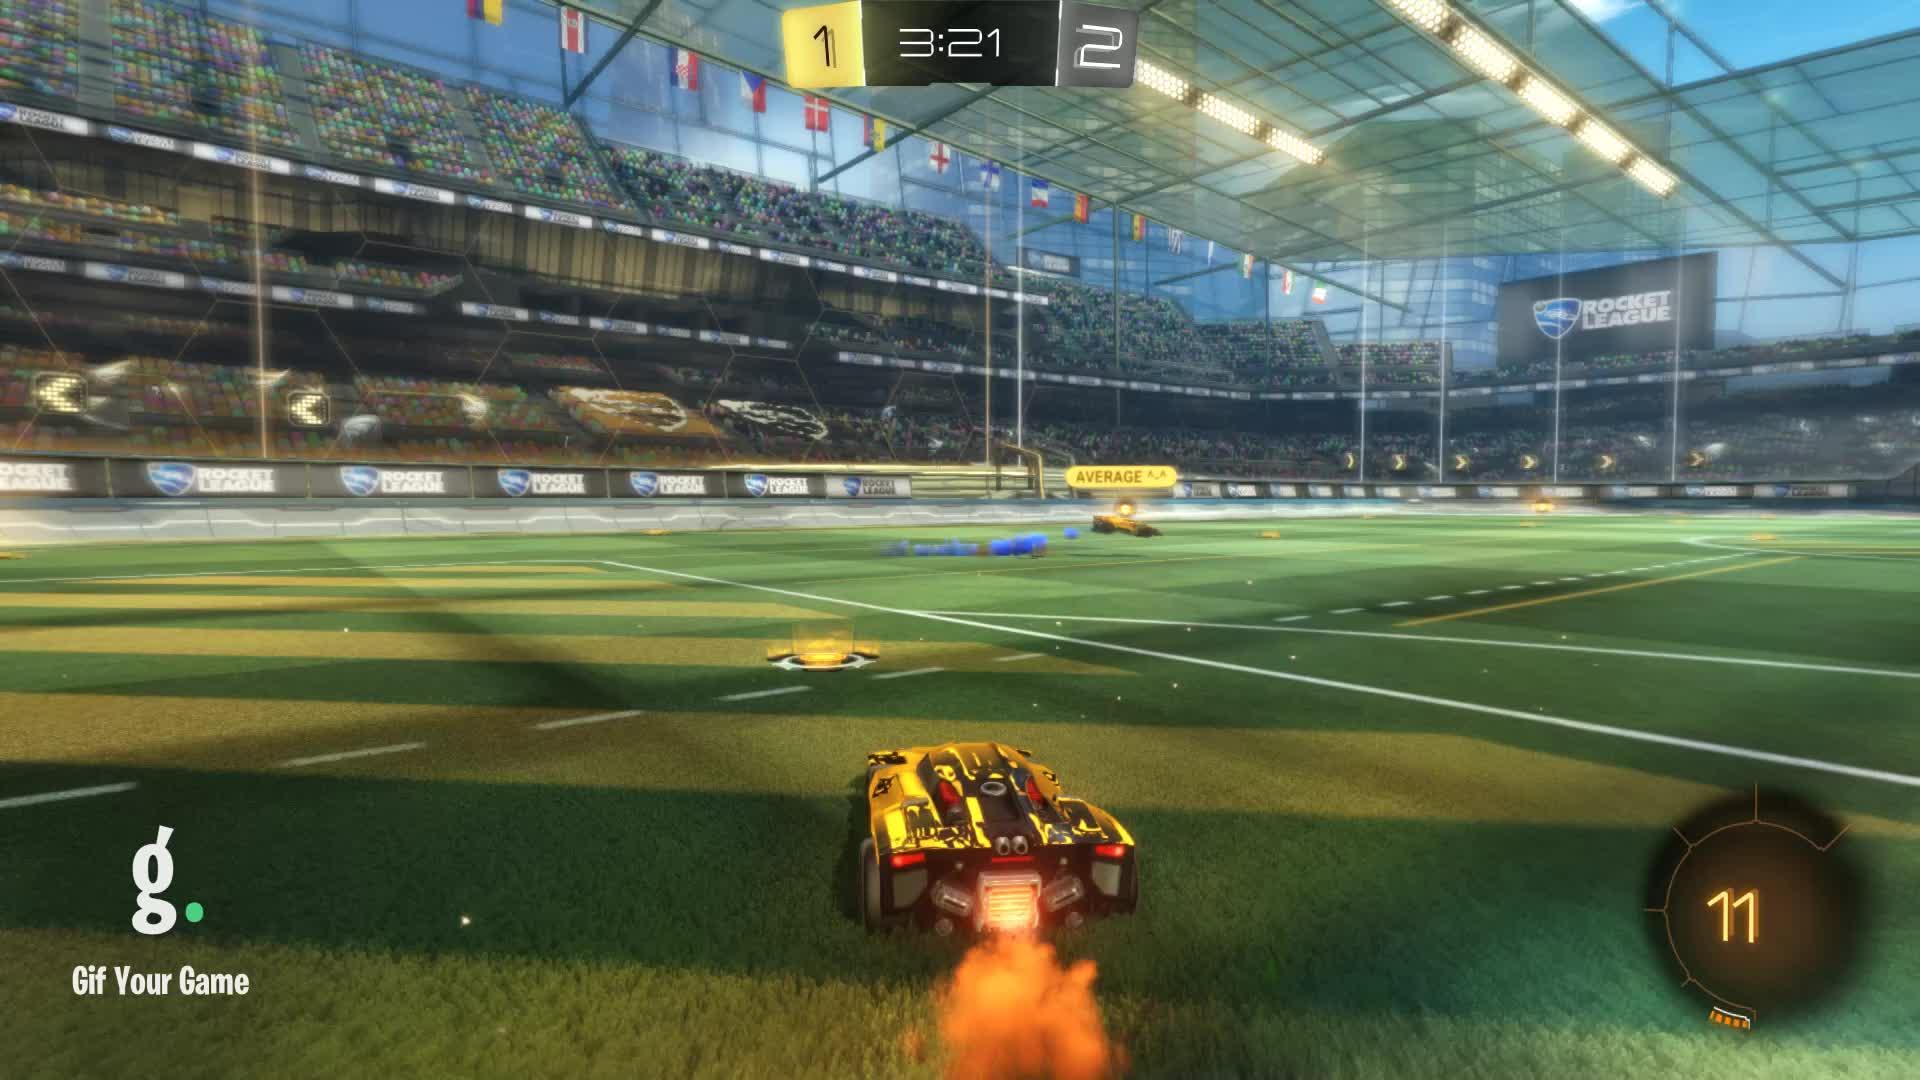 Gif Your Game, GifYourGame, Goal, Rocket League, RocketLeague, datboi, Goal 4: datboi GIFs